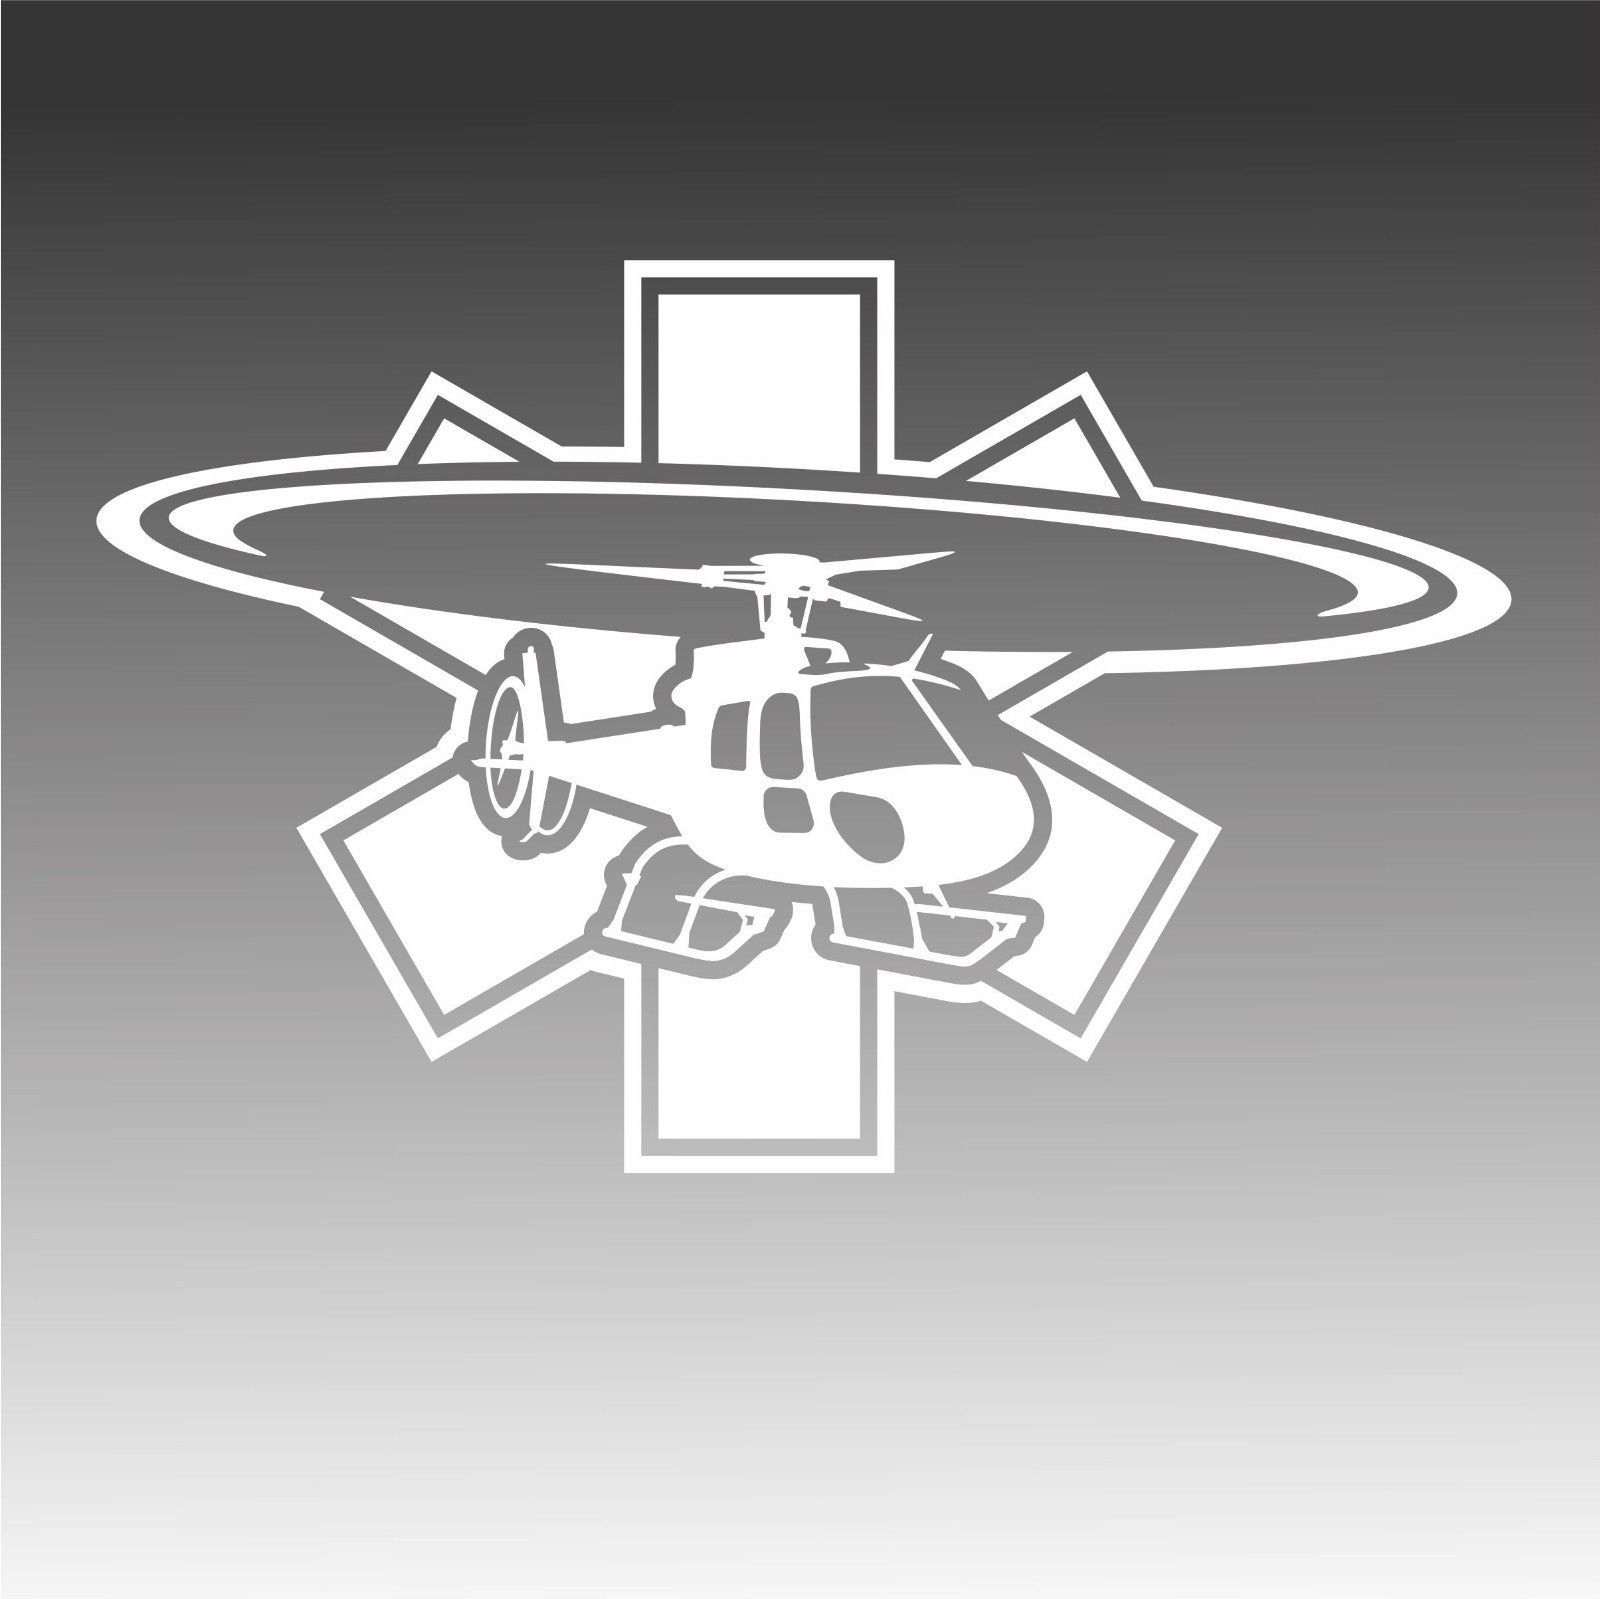 Star Of Life Astar As350 Sticker Medic Ems Star As 350 Crew Decal B [ 1599 x 1600 Pixel ]